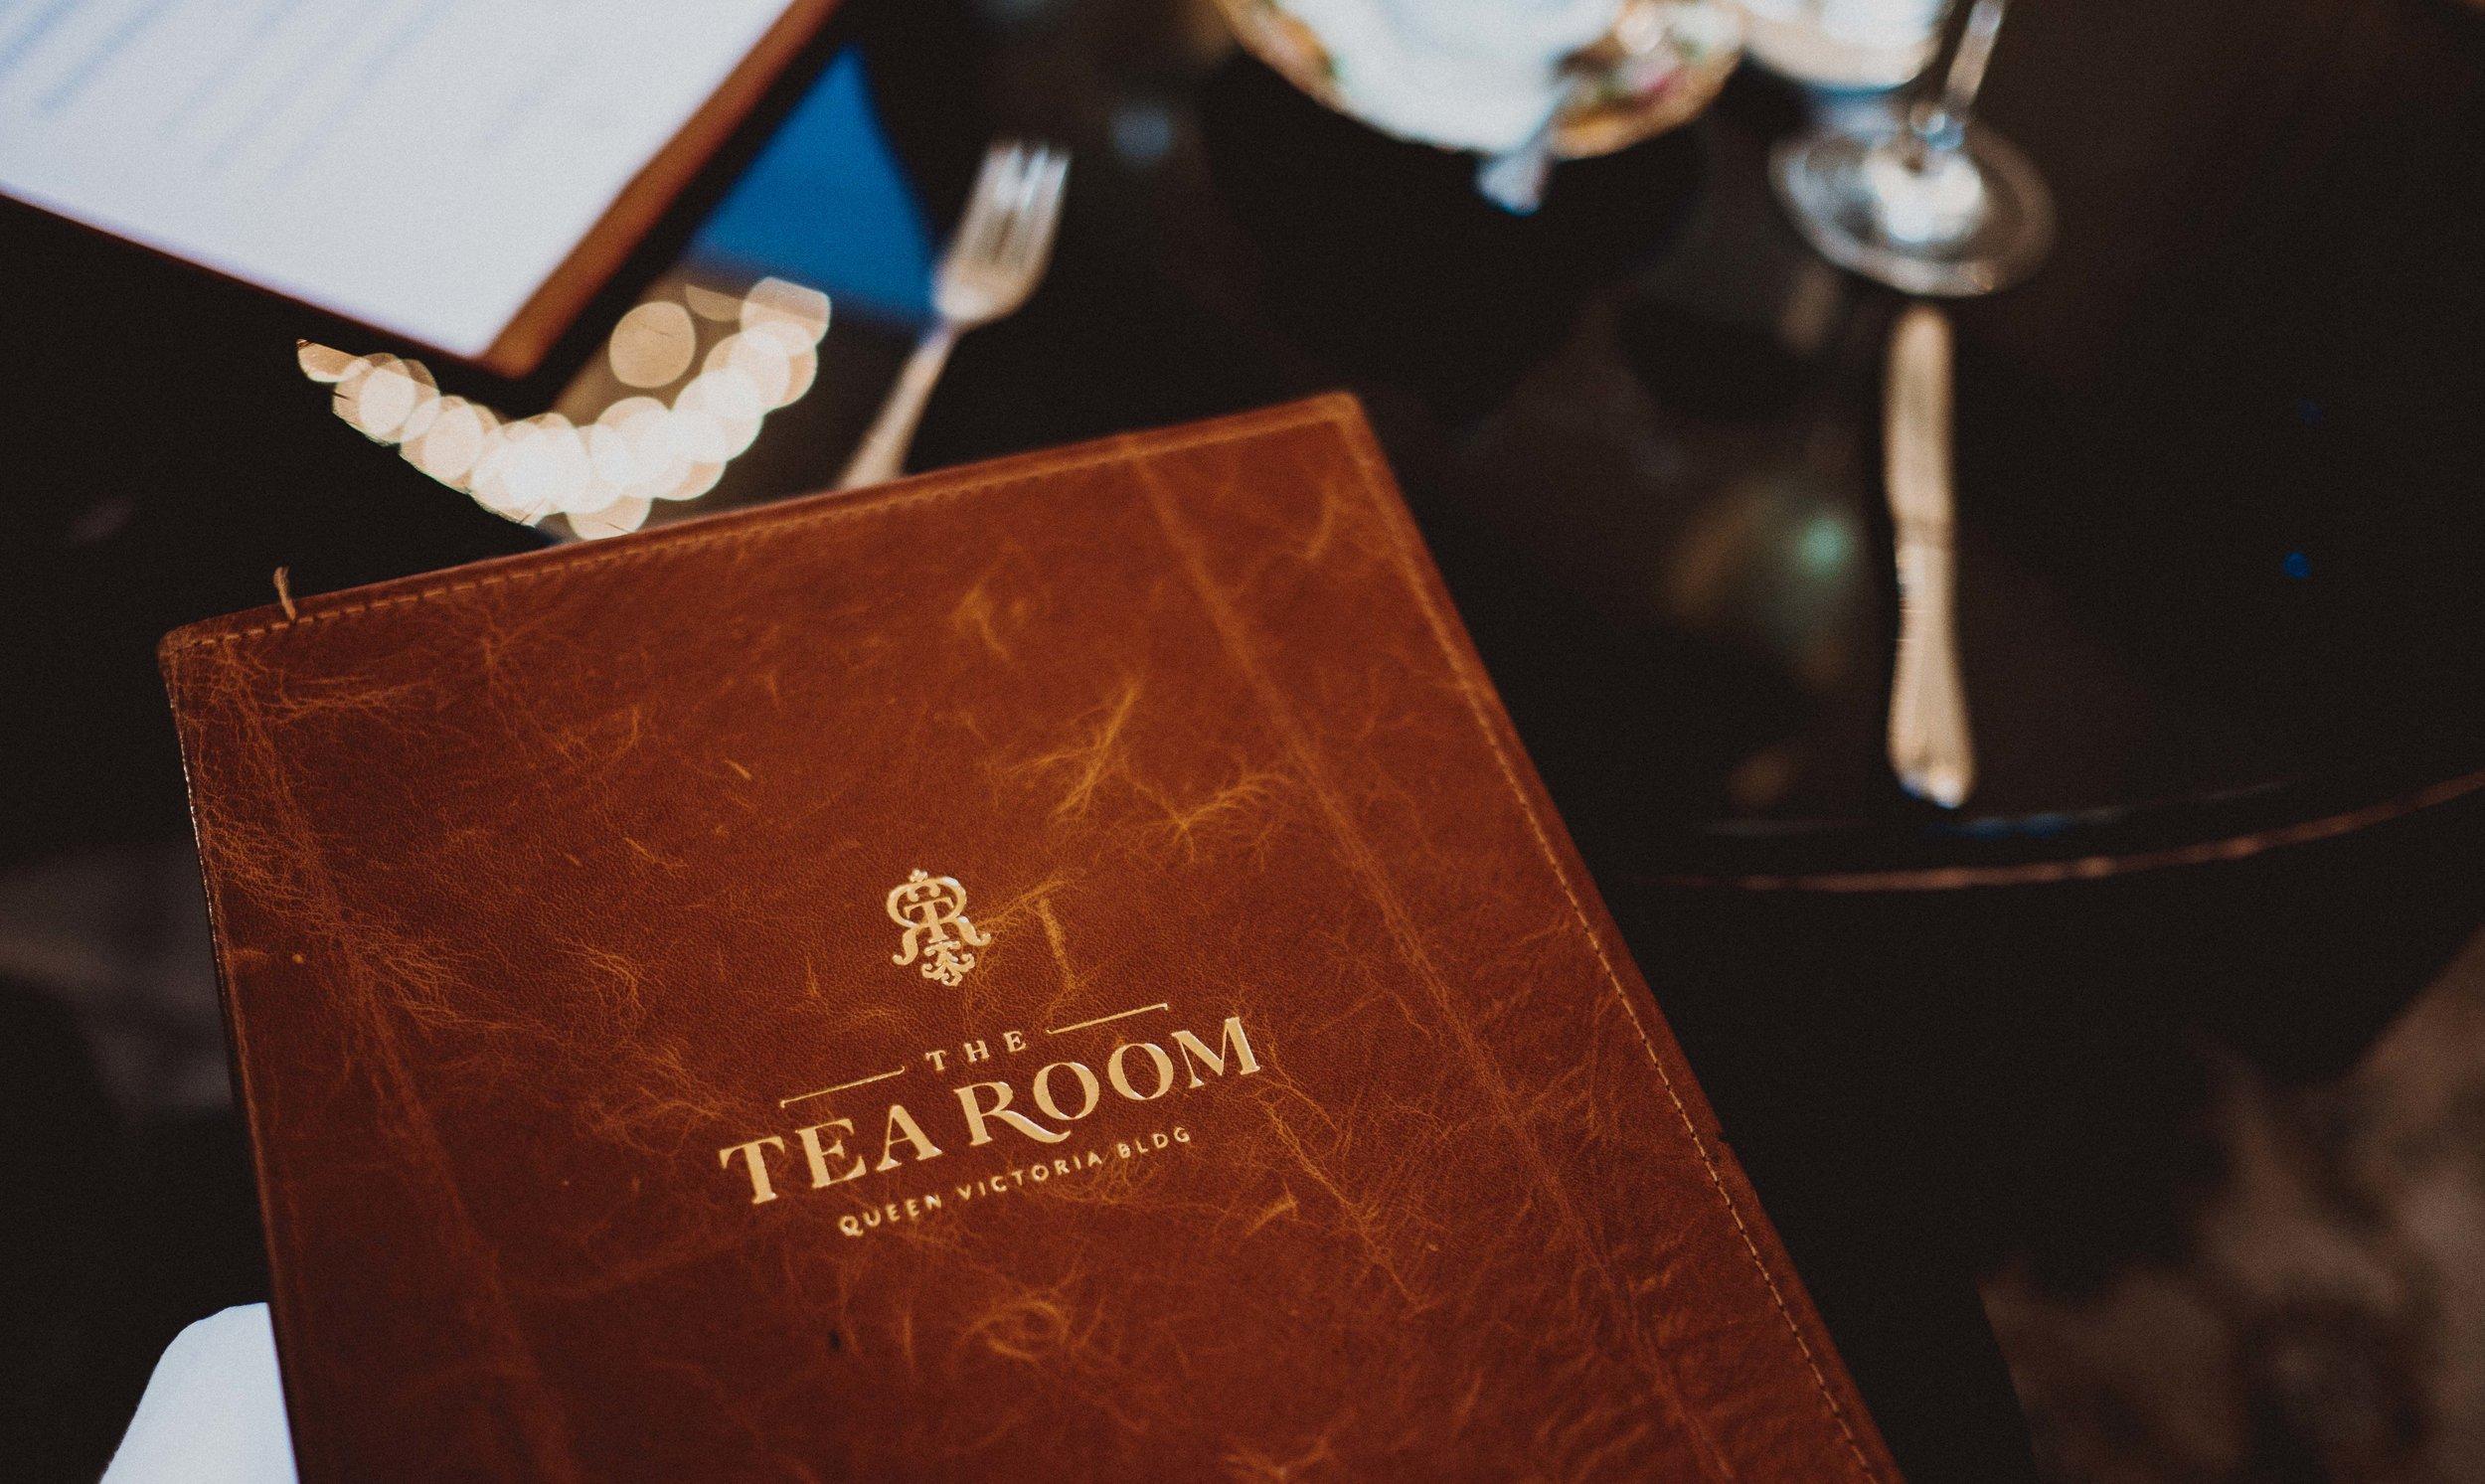 tearoom-2.jpg